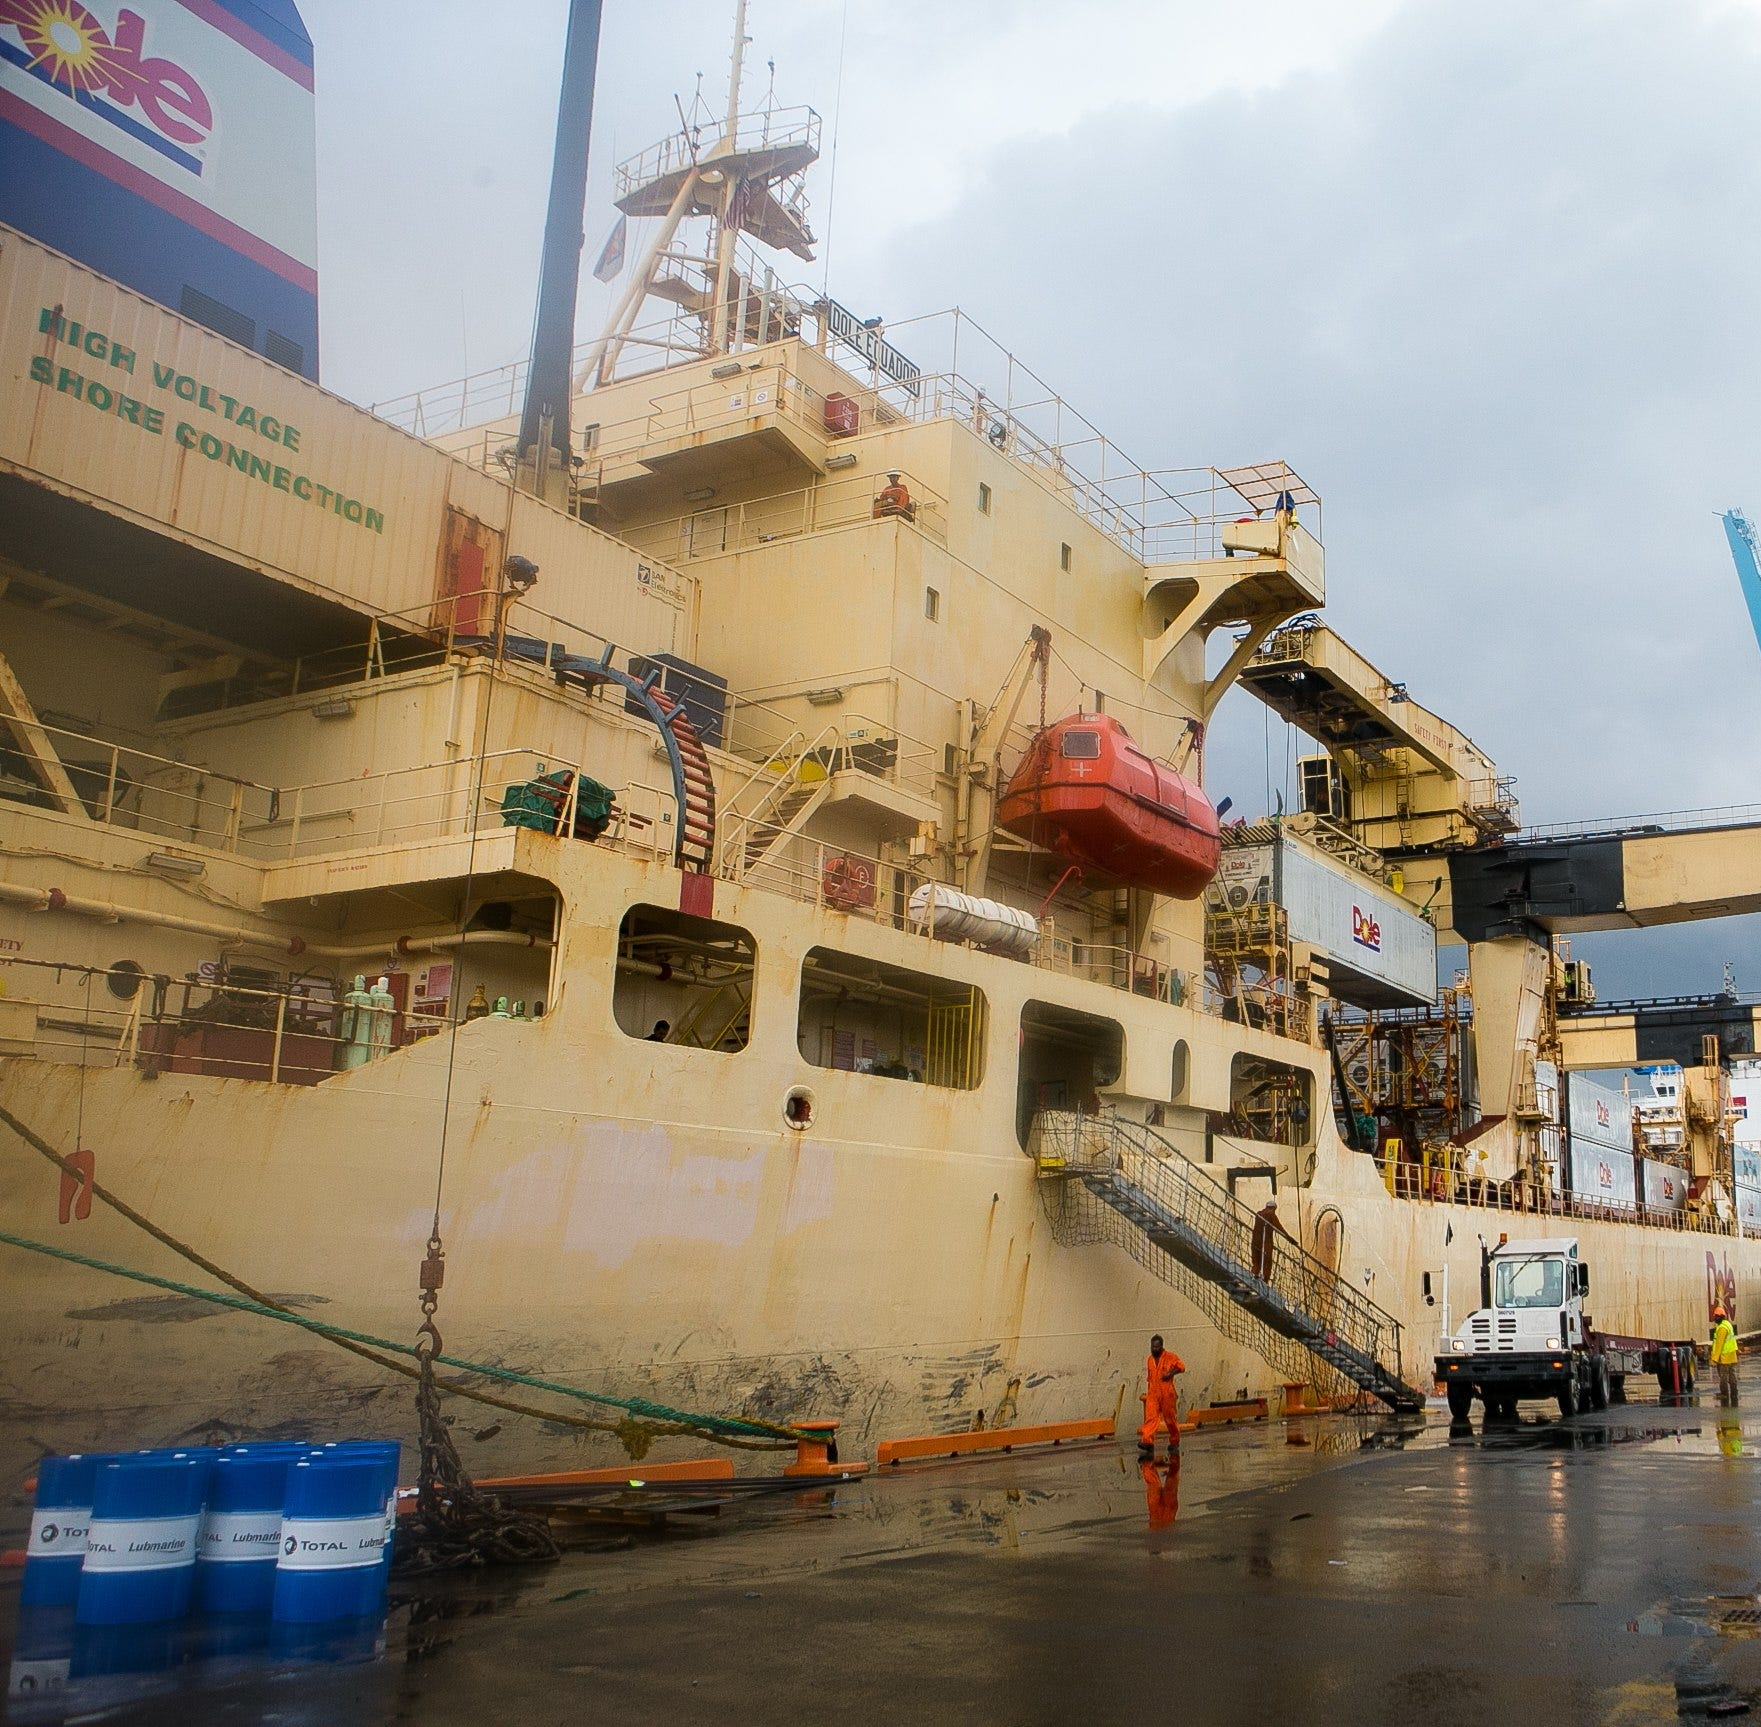 Port of Wilmington privatization deal promises more jobs, stable economic future